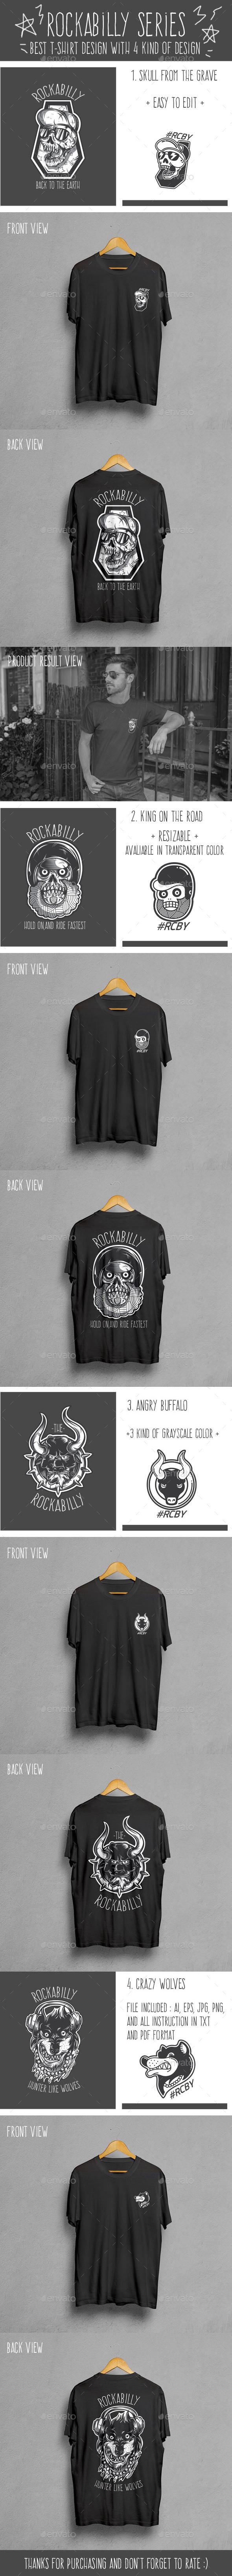 Rockabilly Series T-Shirt Design - Grunge Designs